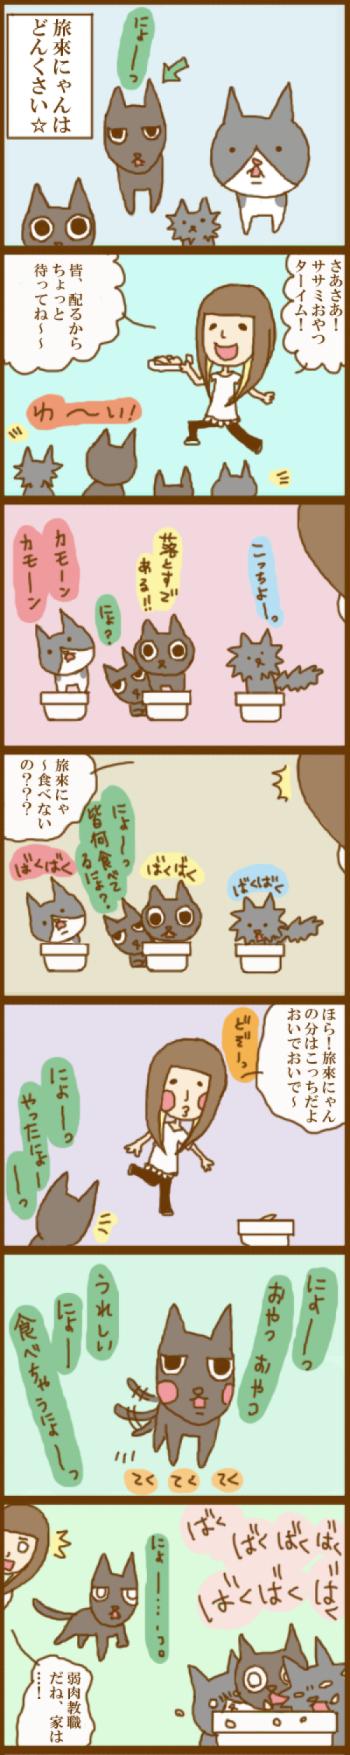 f:id:suzuokayu:20201118104452j:plain